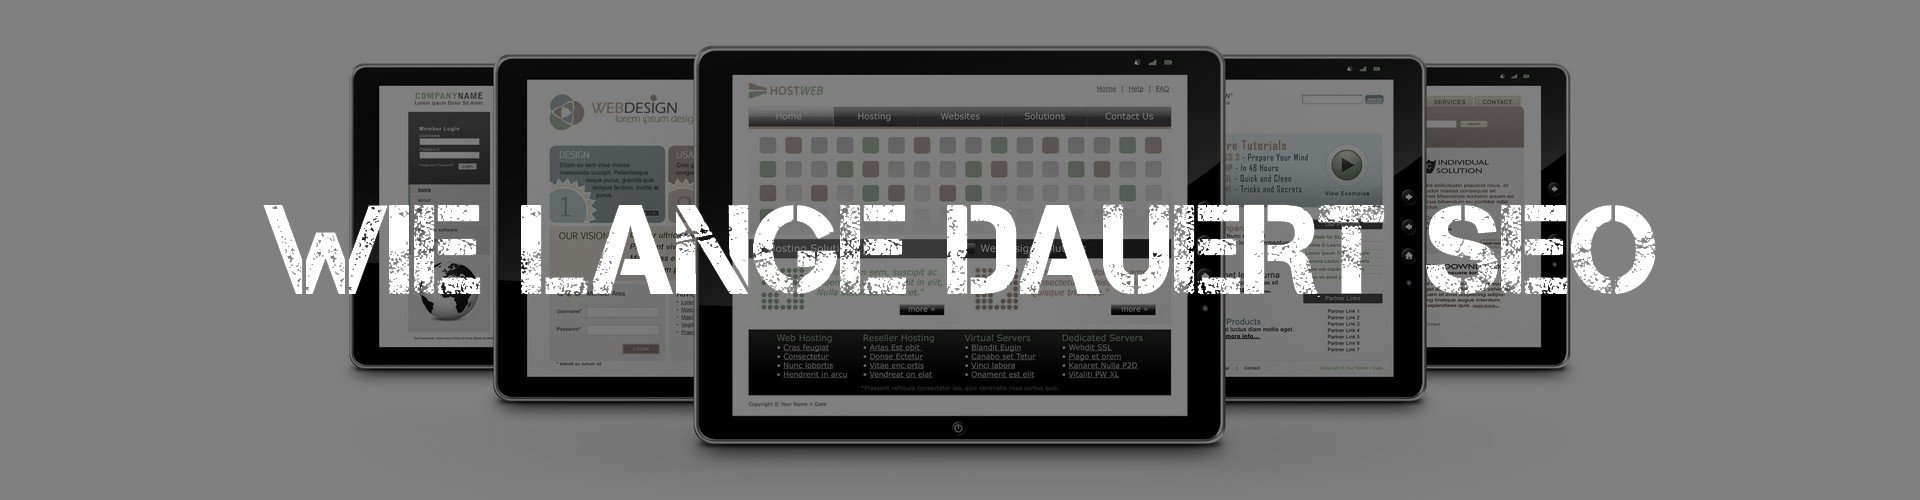 Wie-lange-dauert-Seo-Agentur-Hannover-Langenhagen-Region-Prometheus-Webdesign